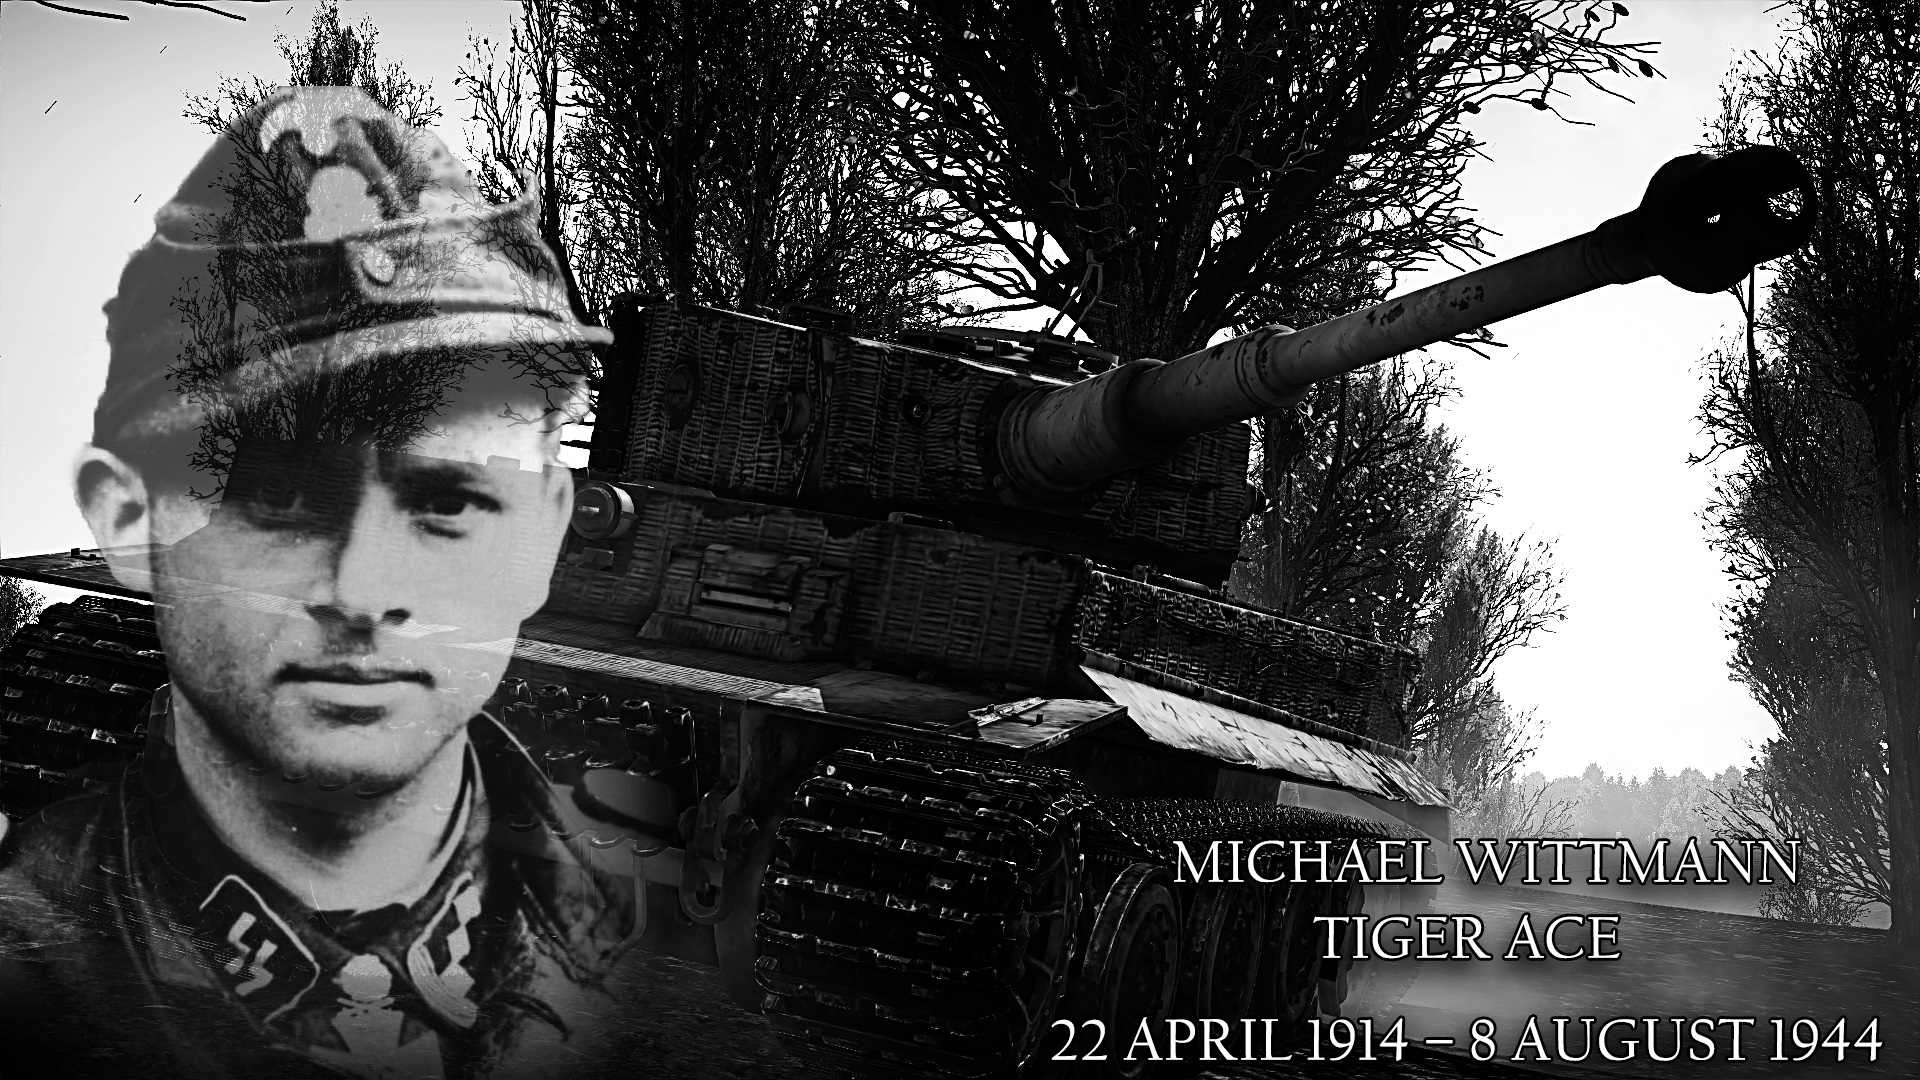 Panzerlied - Version combat